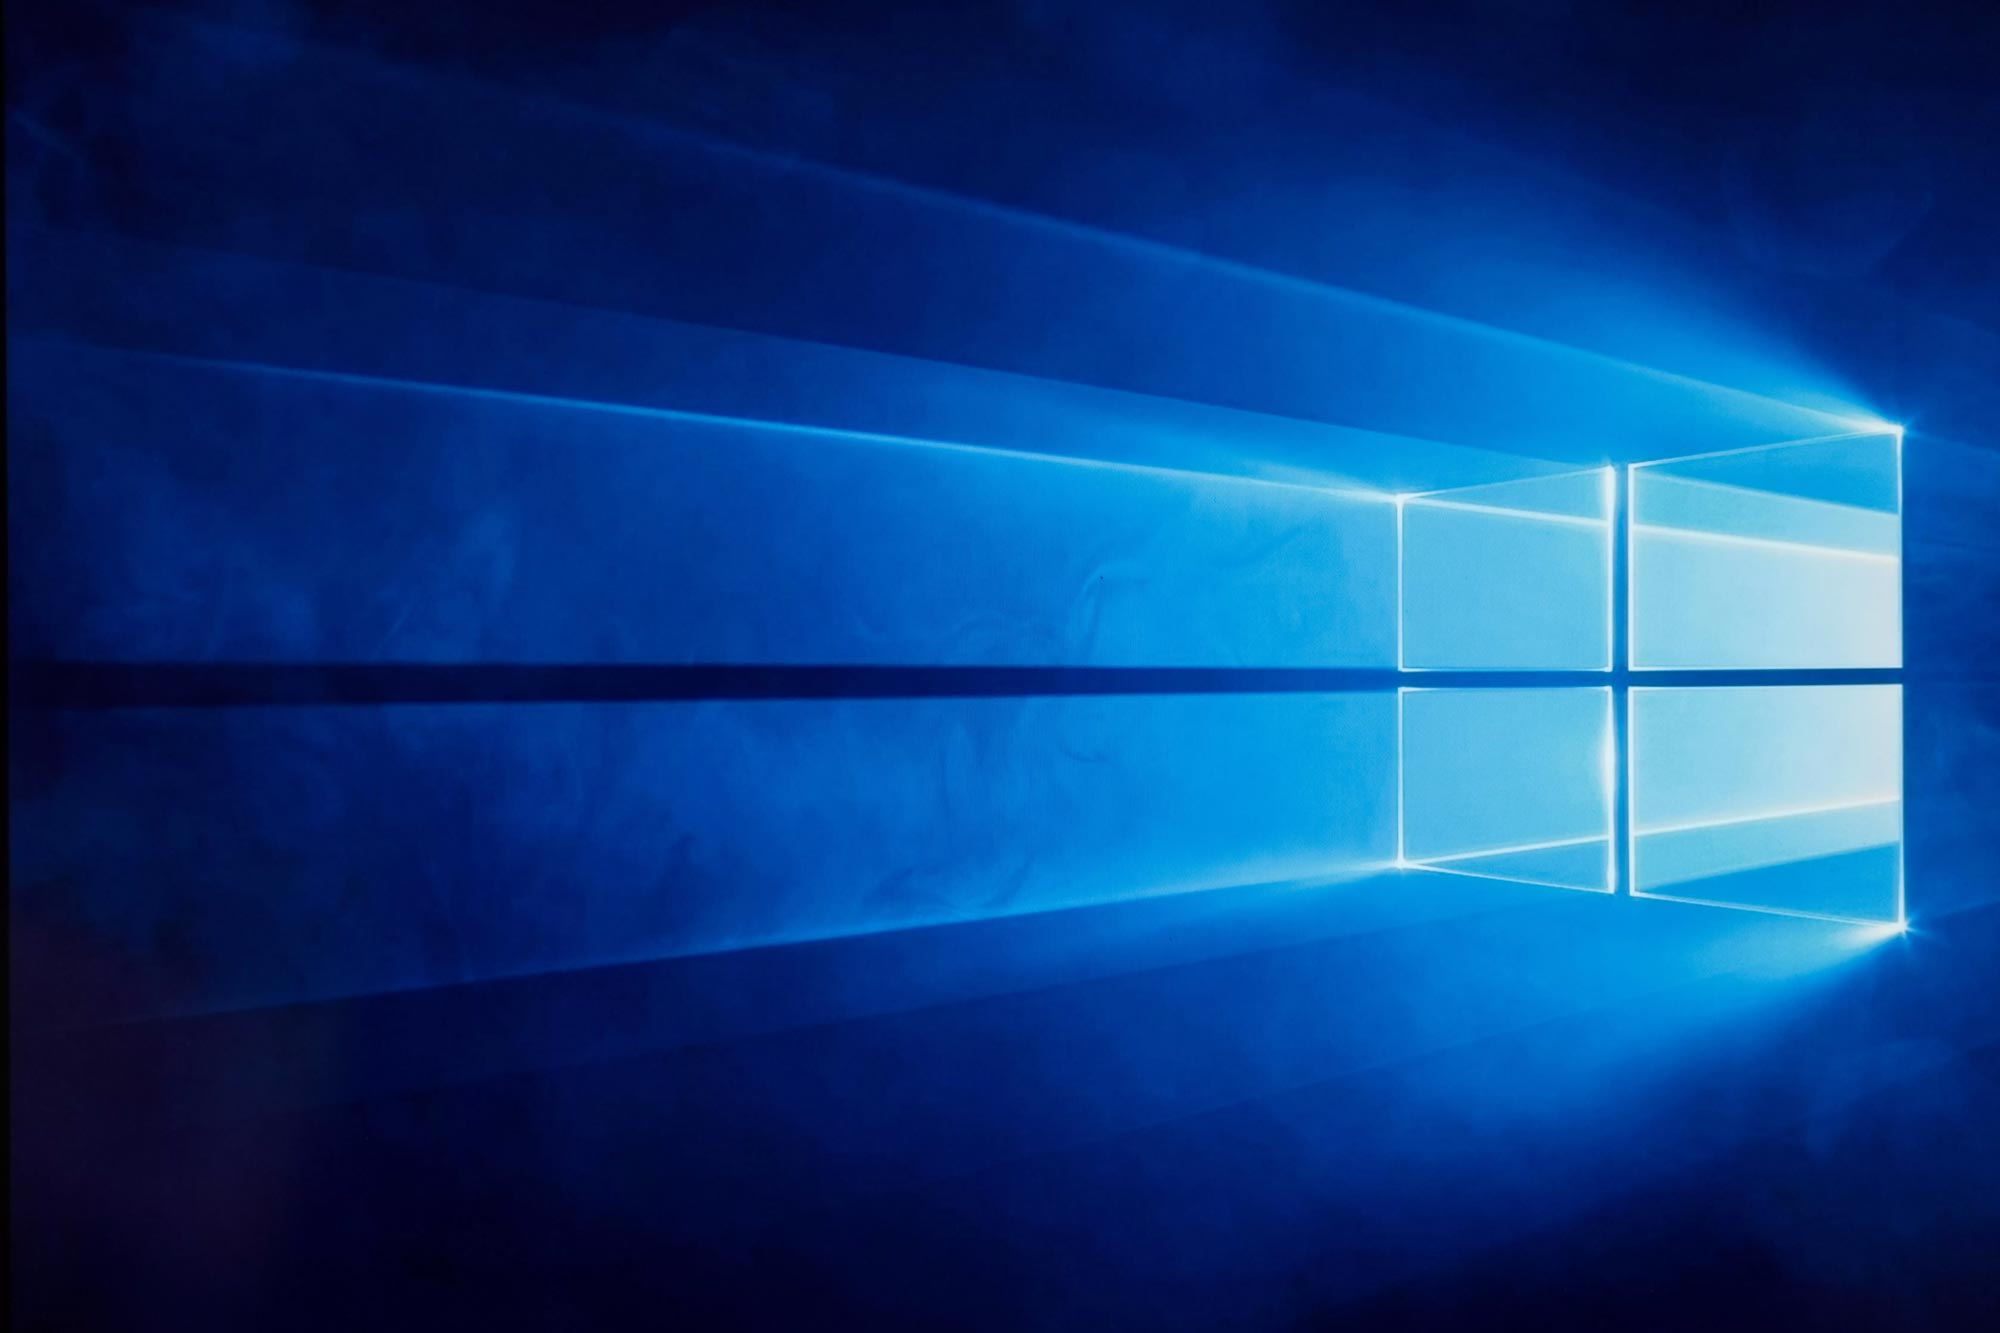 Microsoft Internet Explorer Email